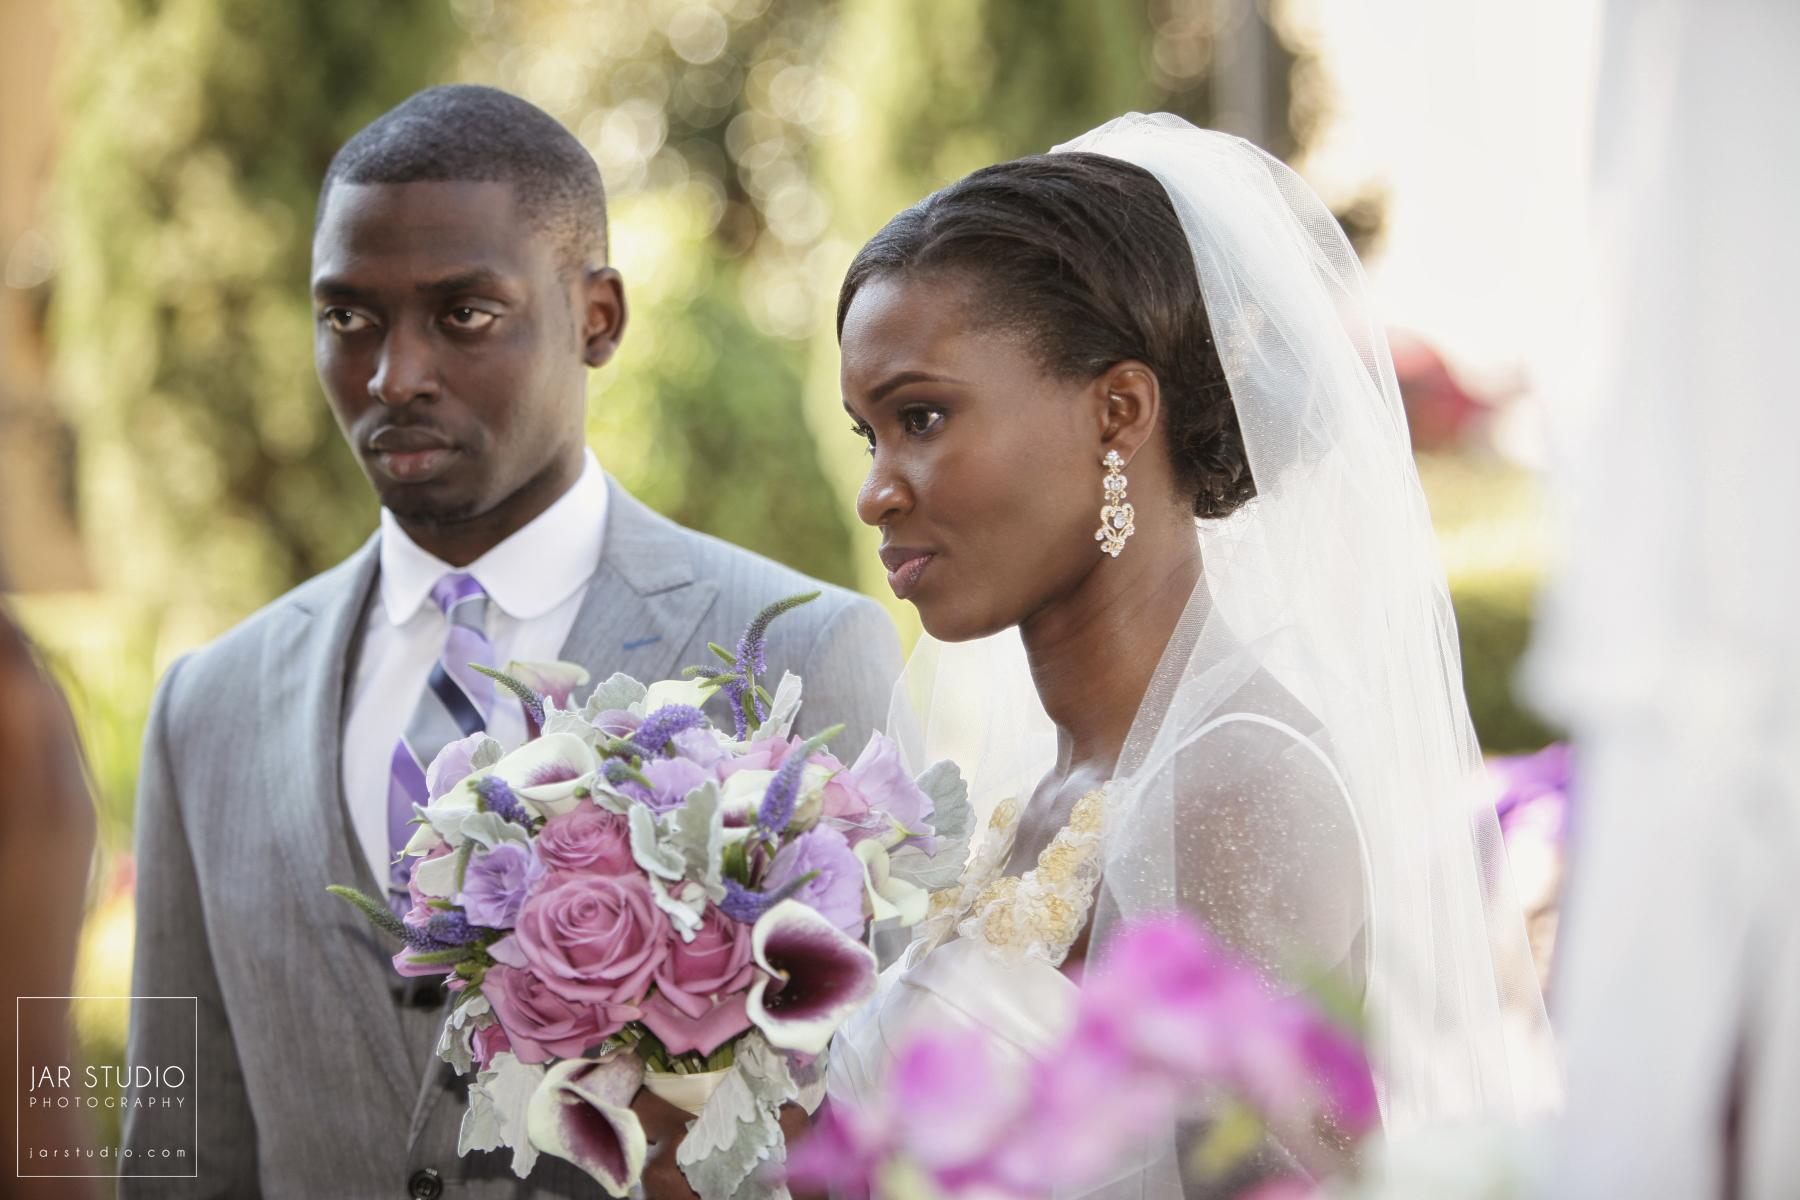 15-modern-nigerian-bride-groom-ceremony-jarstudio-photography.JPG